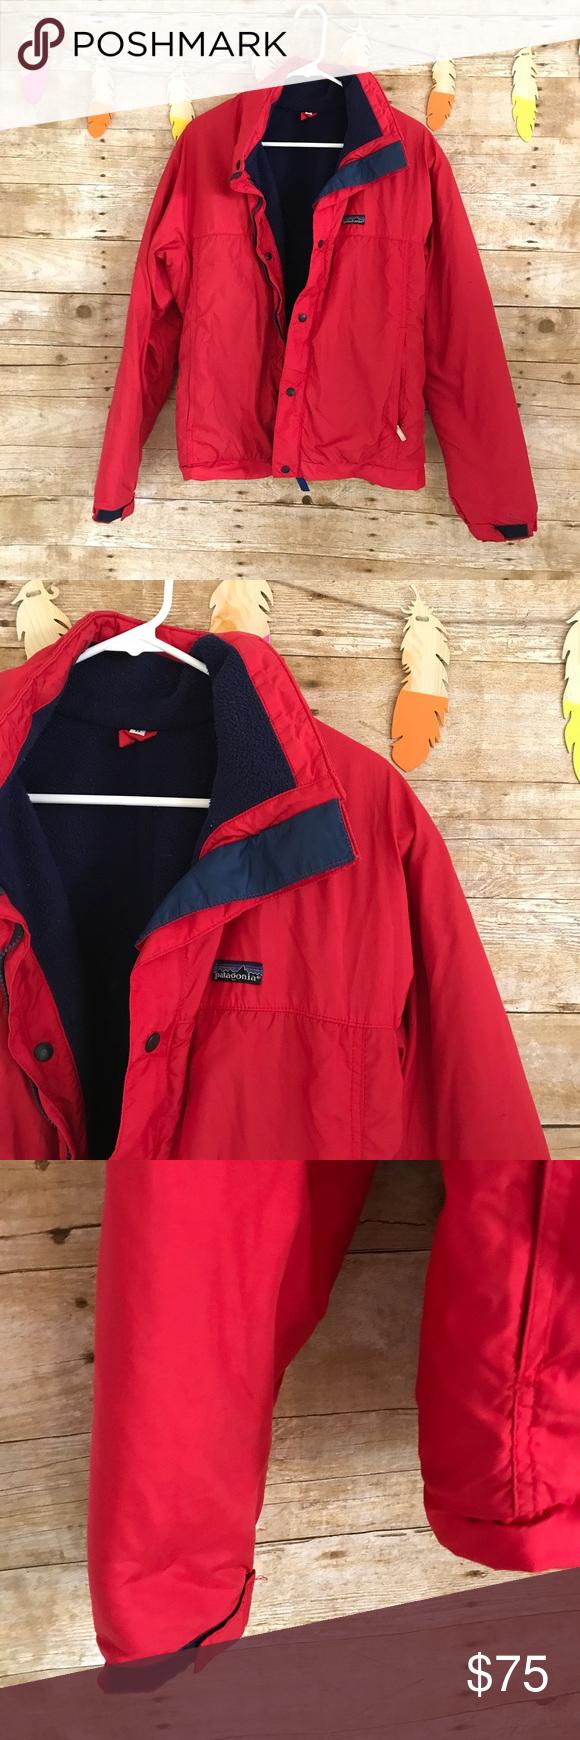 Menus vintage red patagonia fleece puffer jacket patagonia fleece